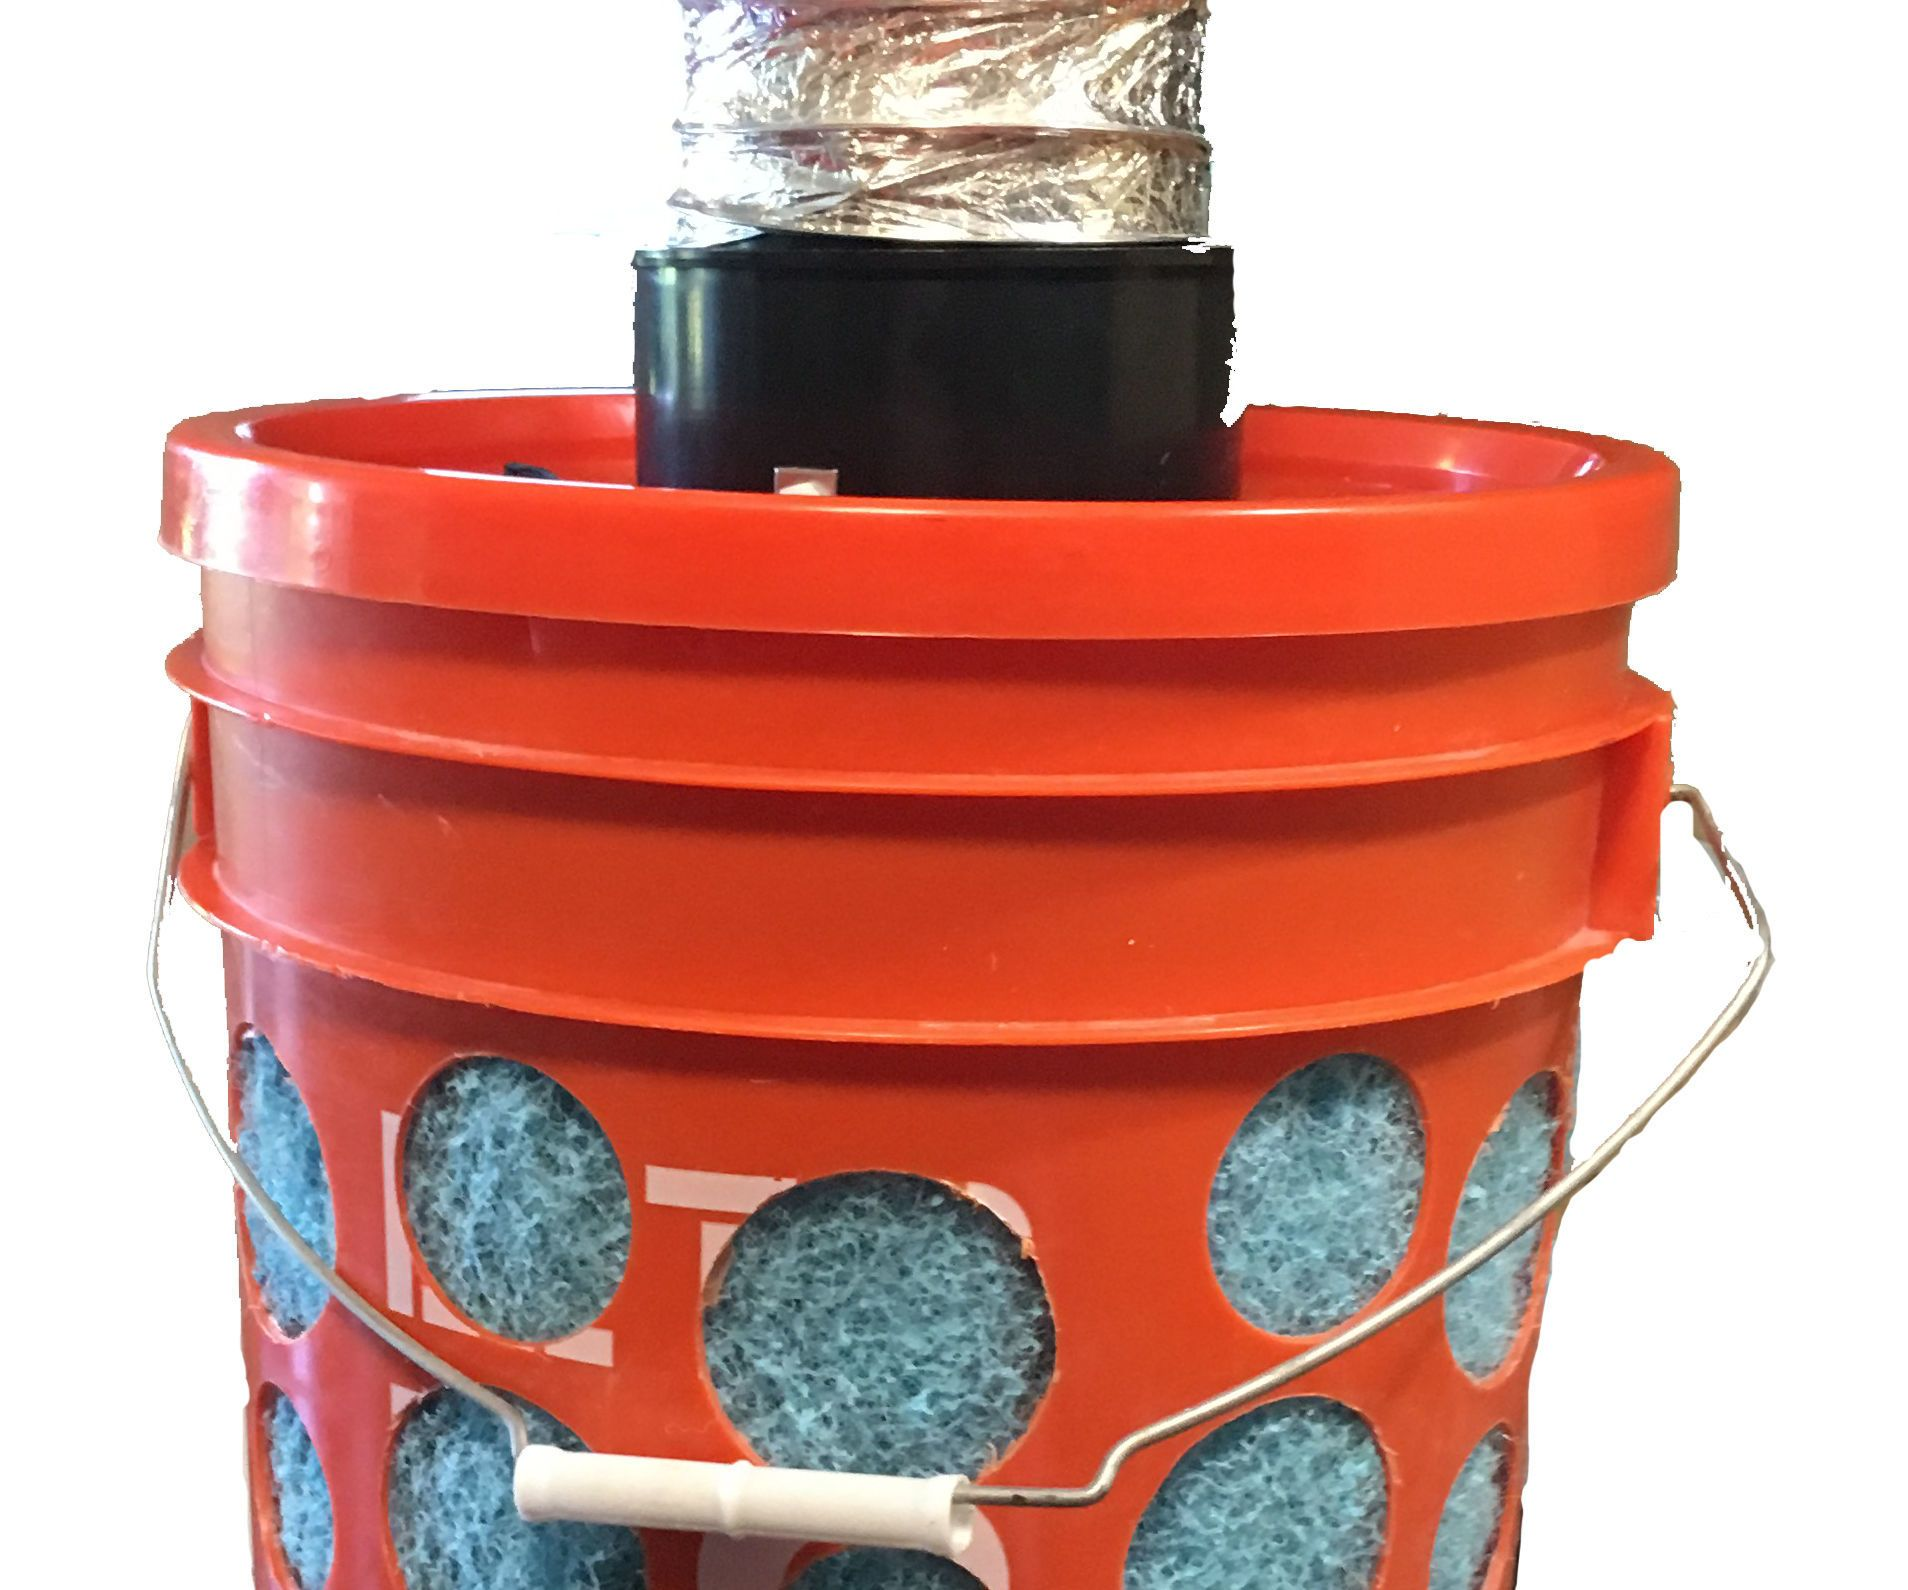 diy swamp cooler 5 gallon bucket